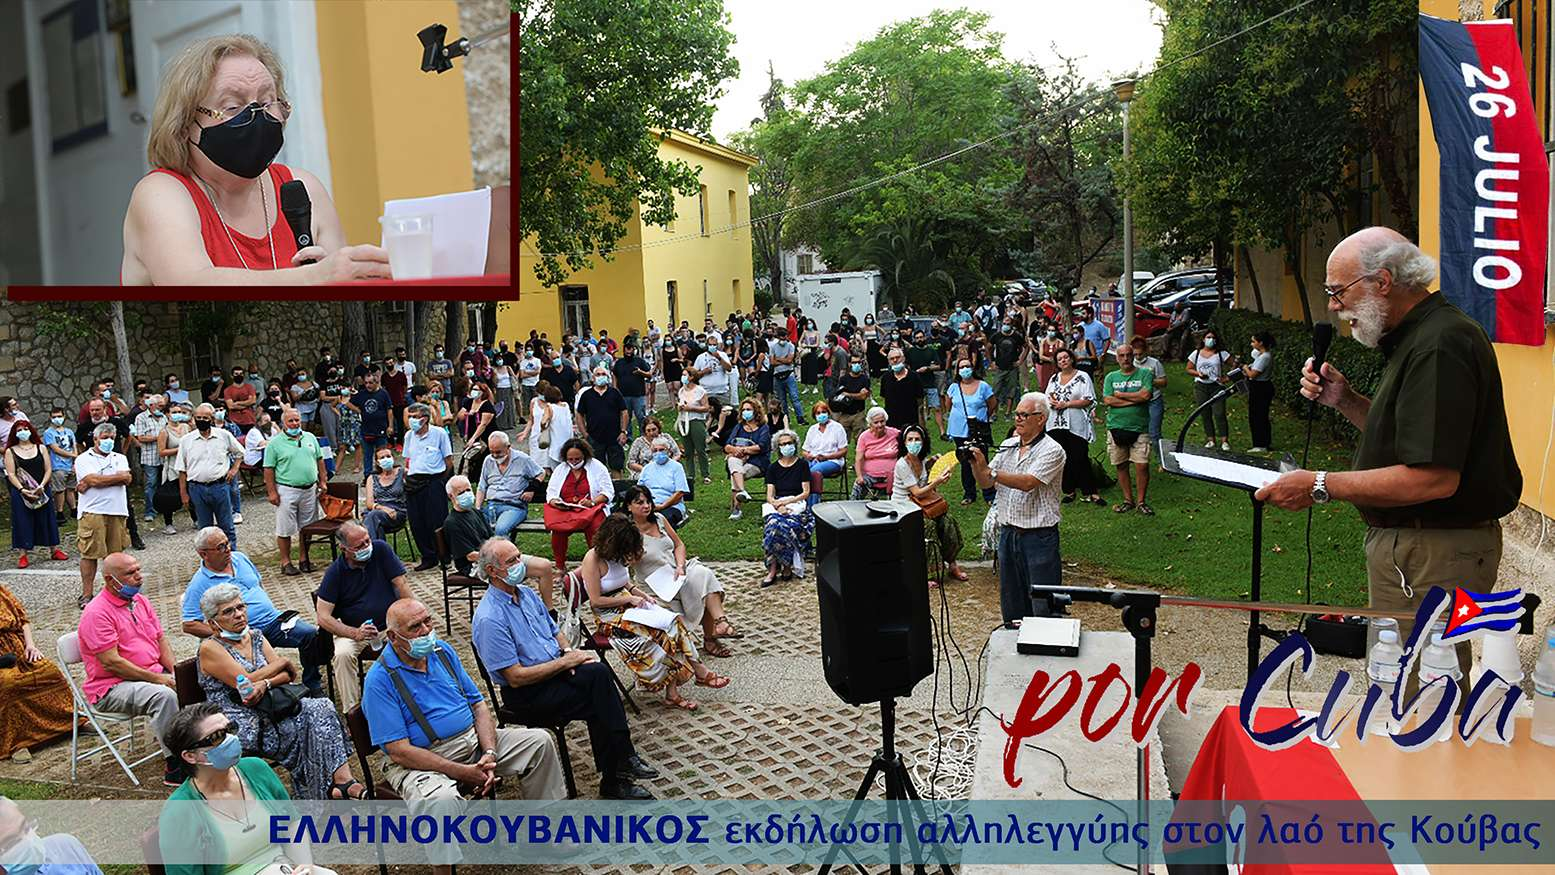 ellhnokouvnikos syndesmos εκδήλωση Αλληλεγγύης ΣΦΕΑ